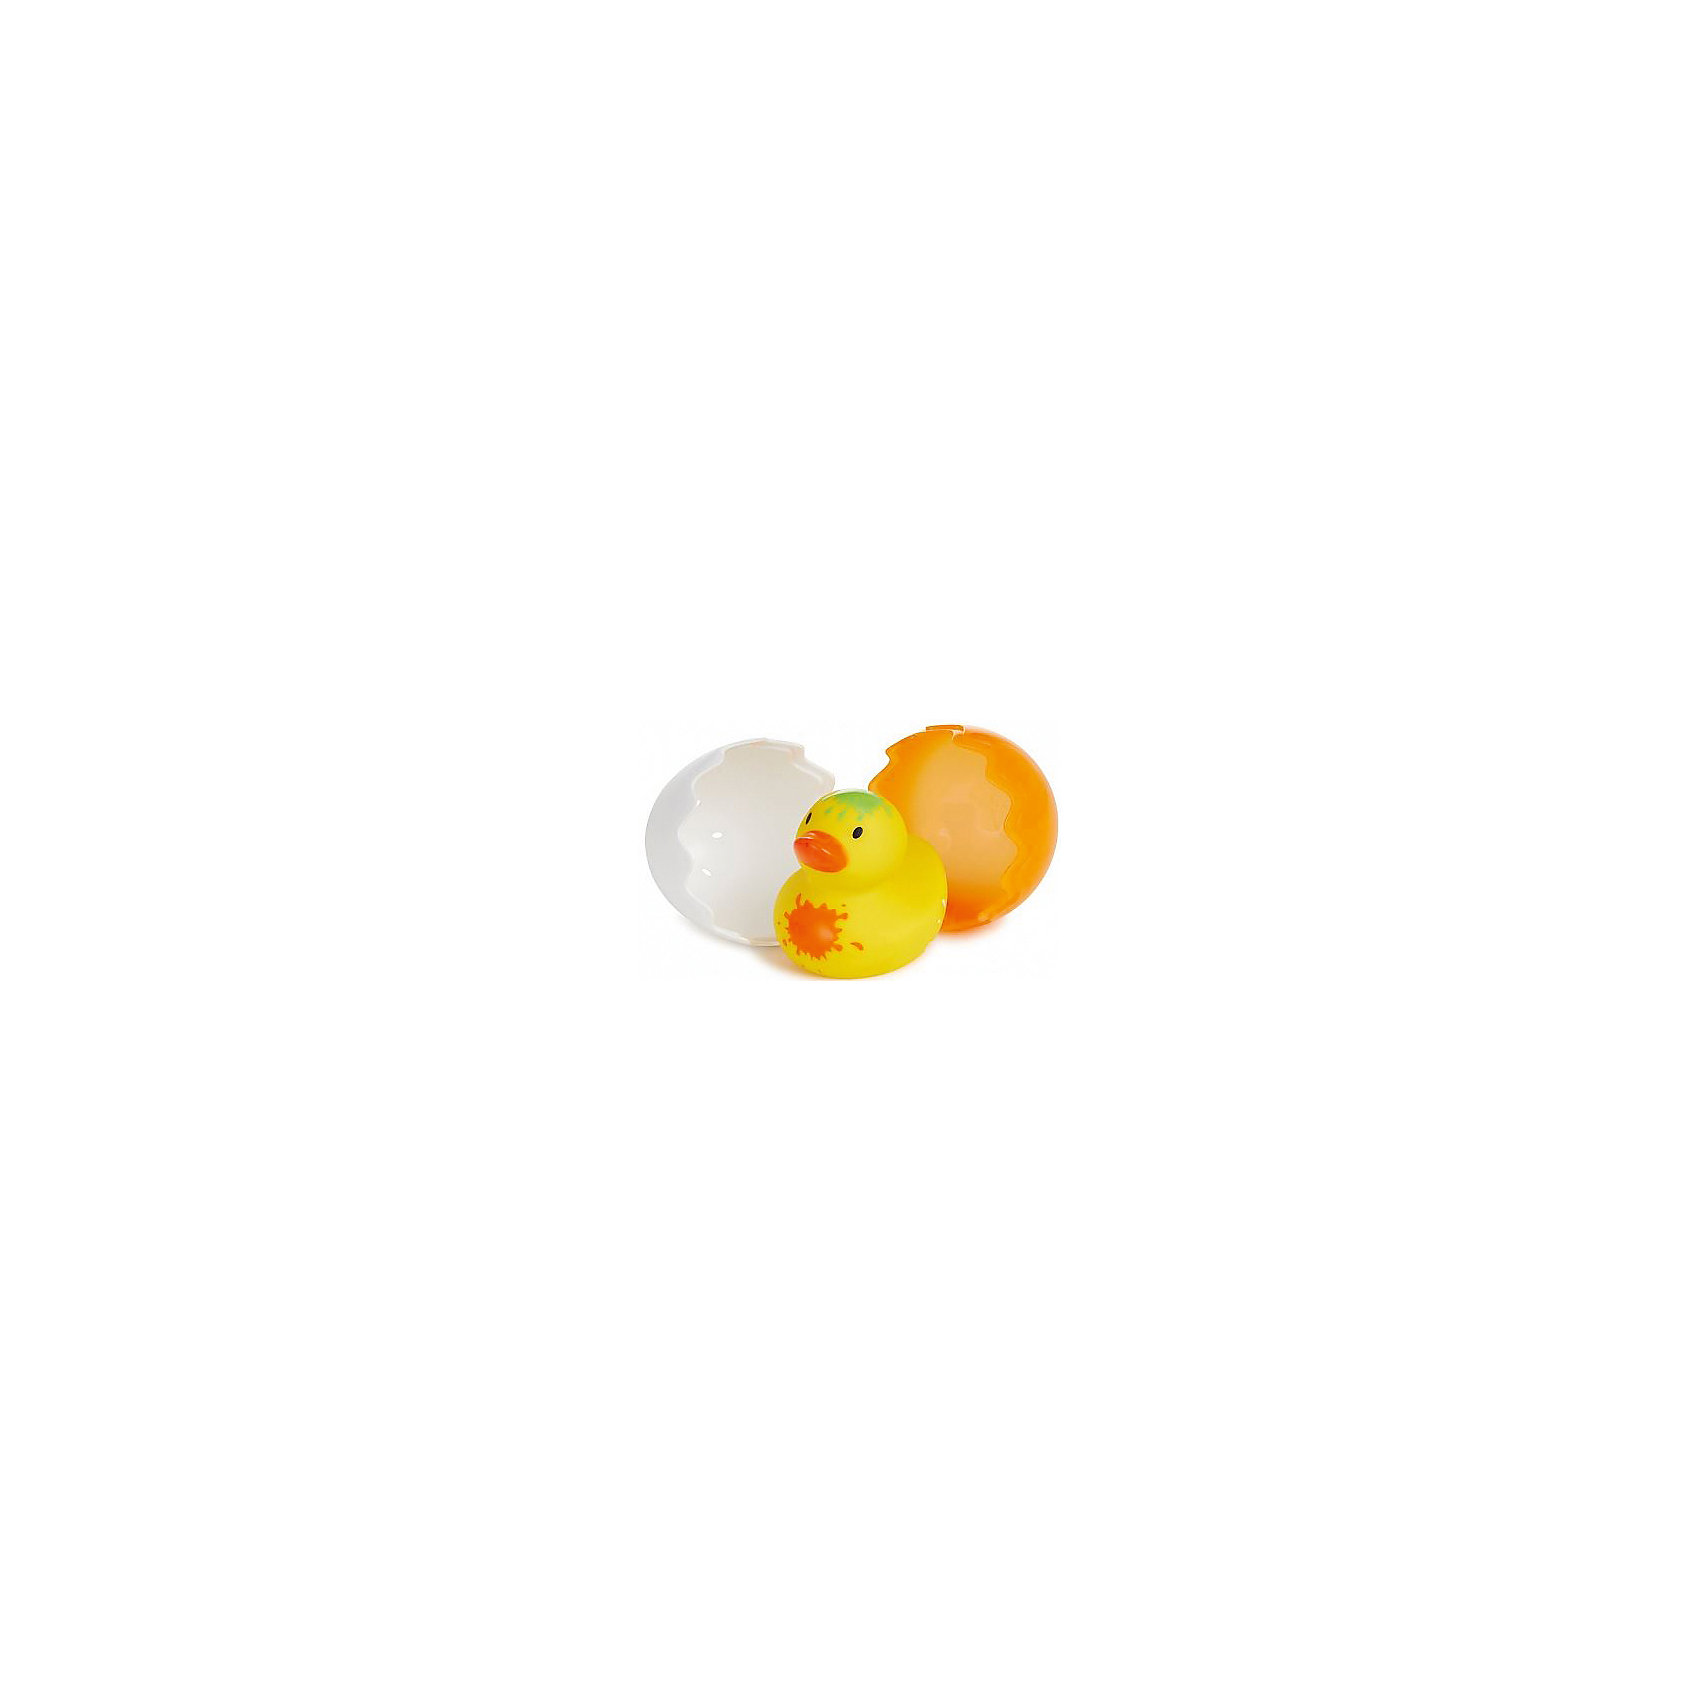 munchkin Игрушки для ванны Утёнок 6+, Munchkin игрушки для ванны munchkin игрушки для ванны ферма